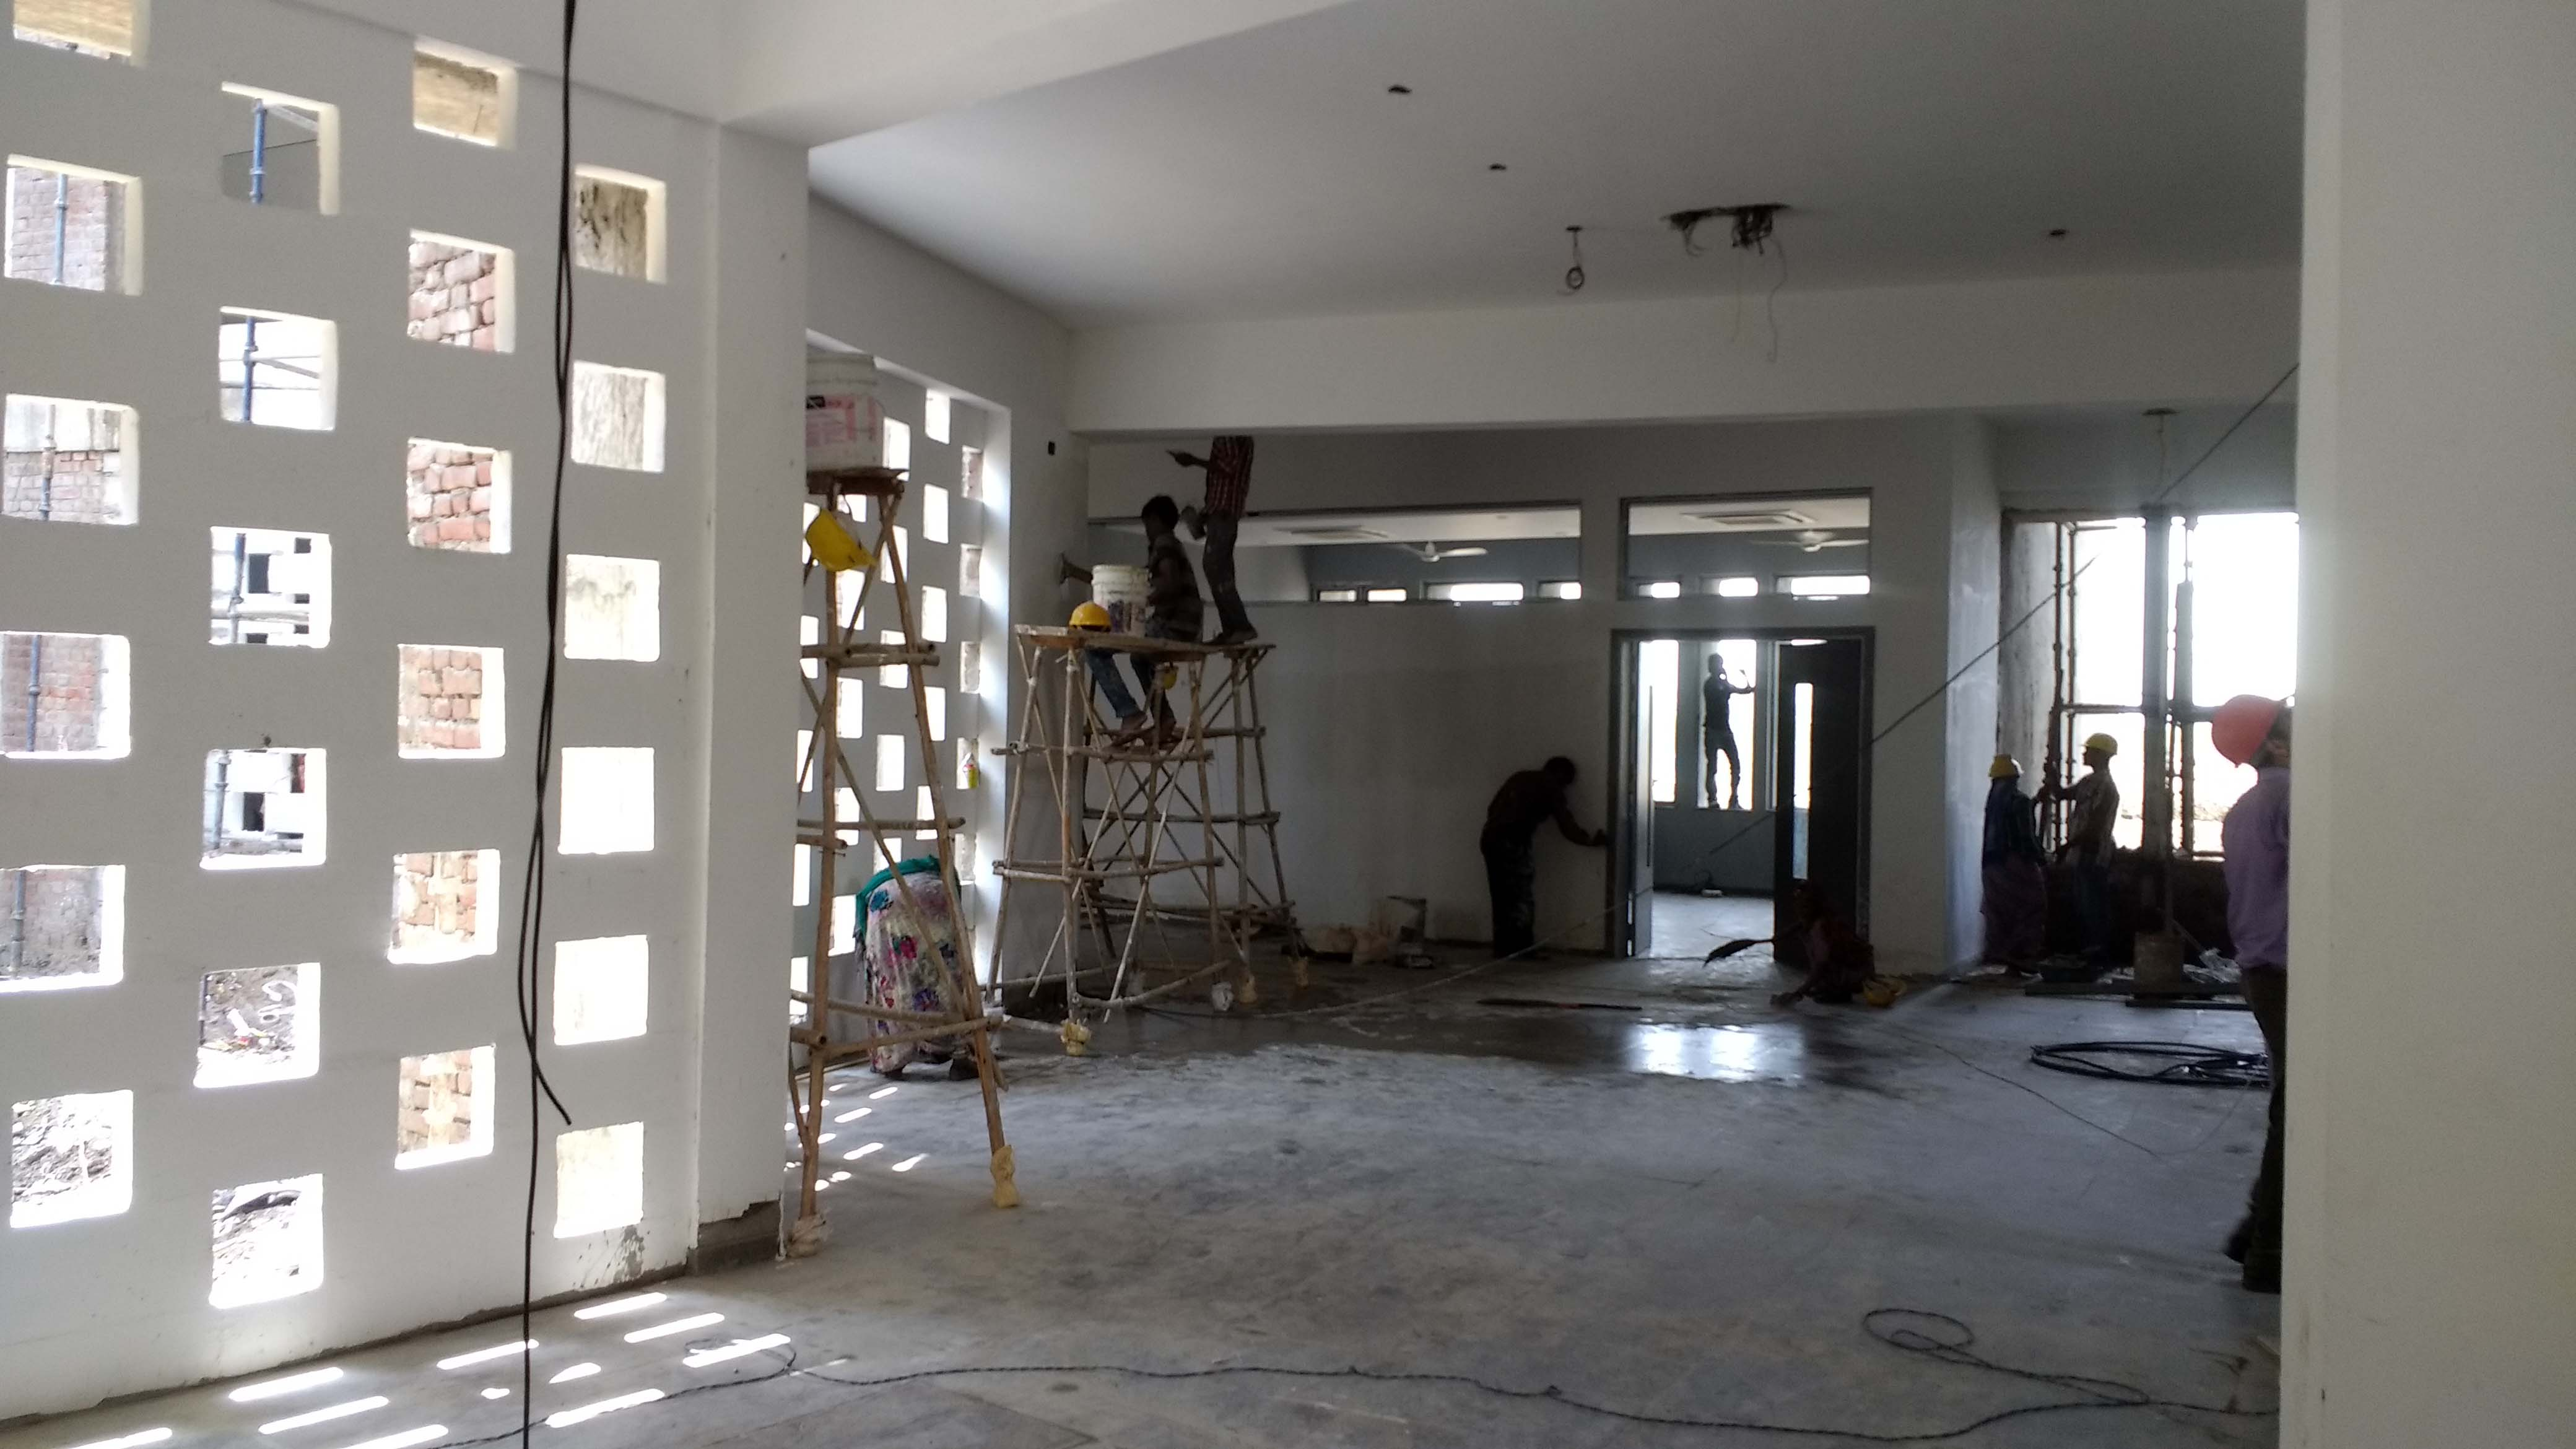 Site Image - Under Construction - Classroom Block Sanjay Puri Architects}